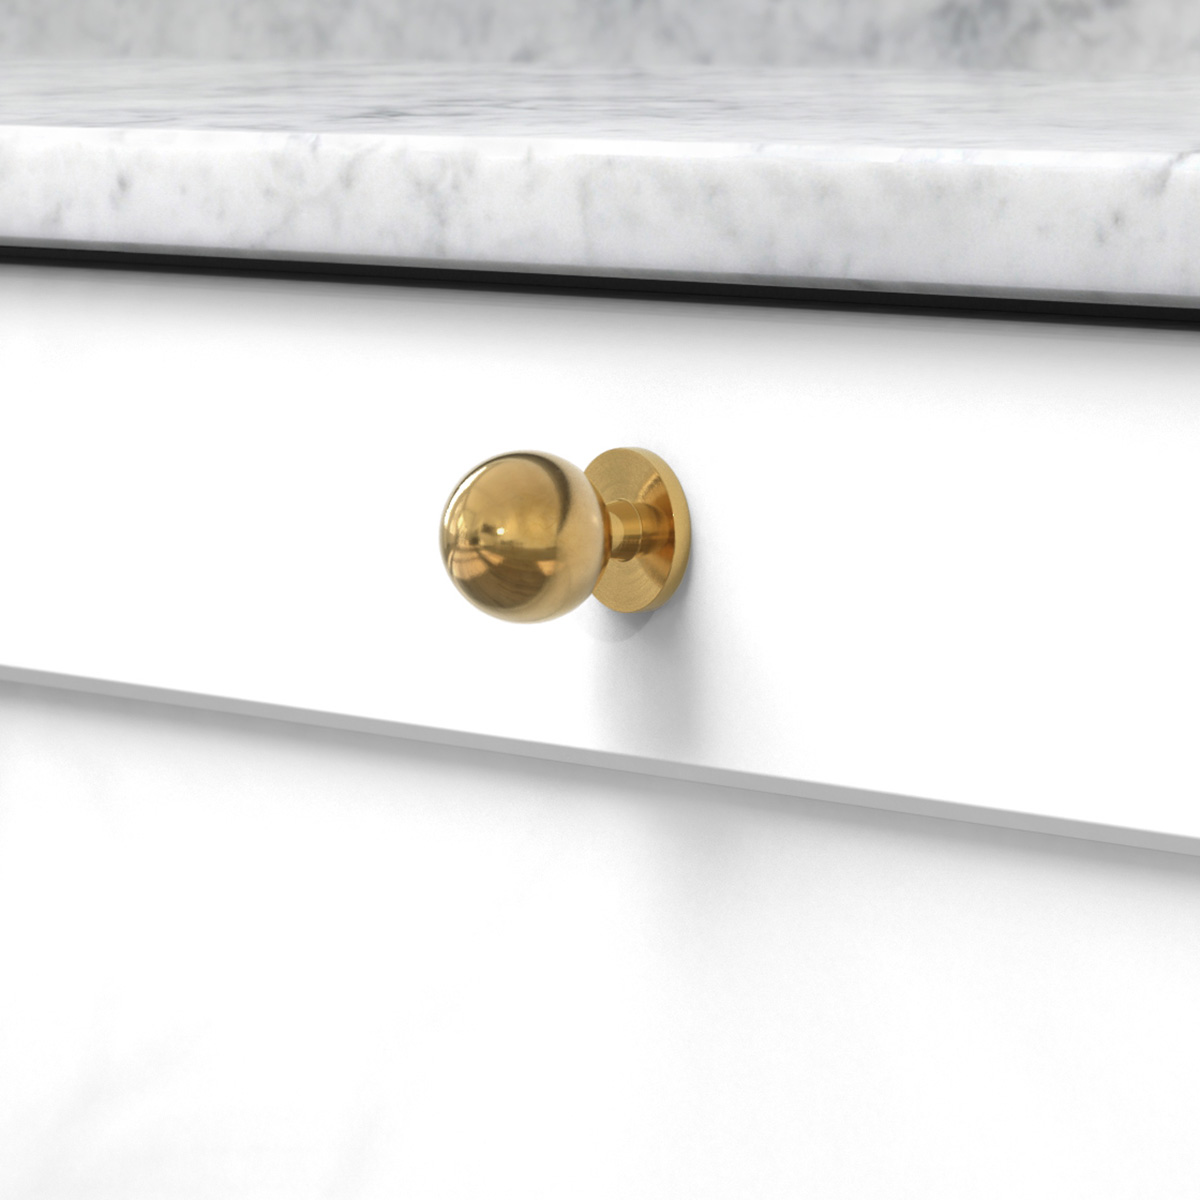 Knopp soliden polerad obehandlad 339433 11 25 mm ncs s 0300 n marmor carrara